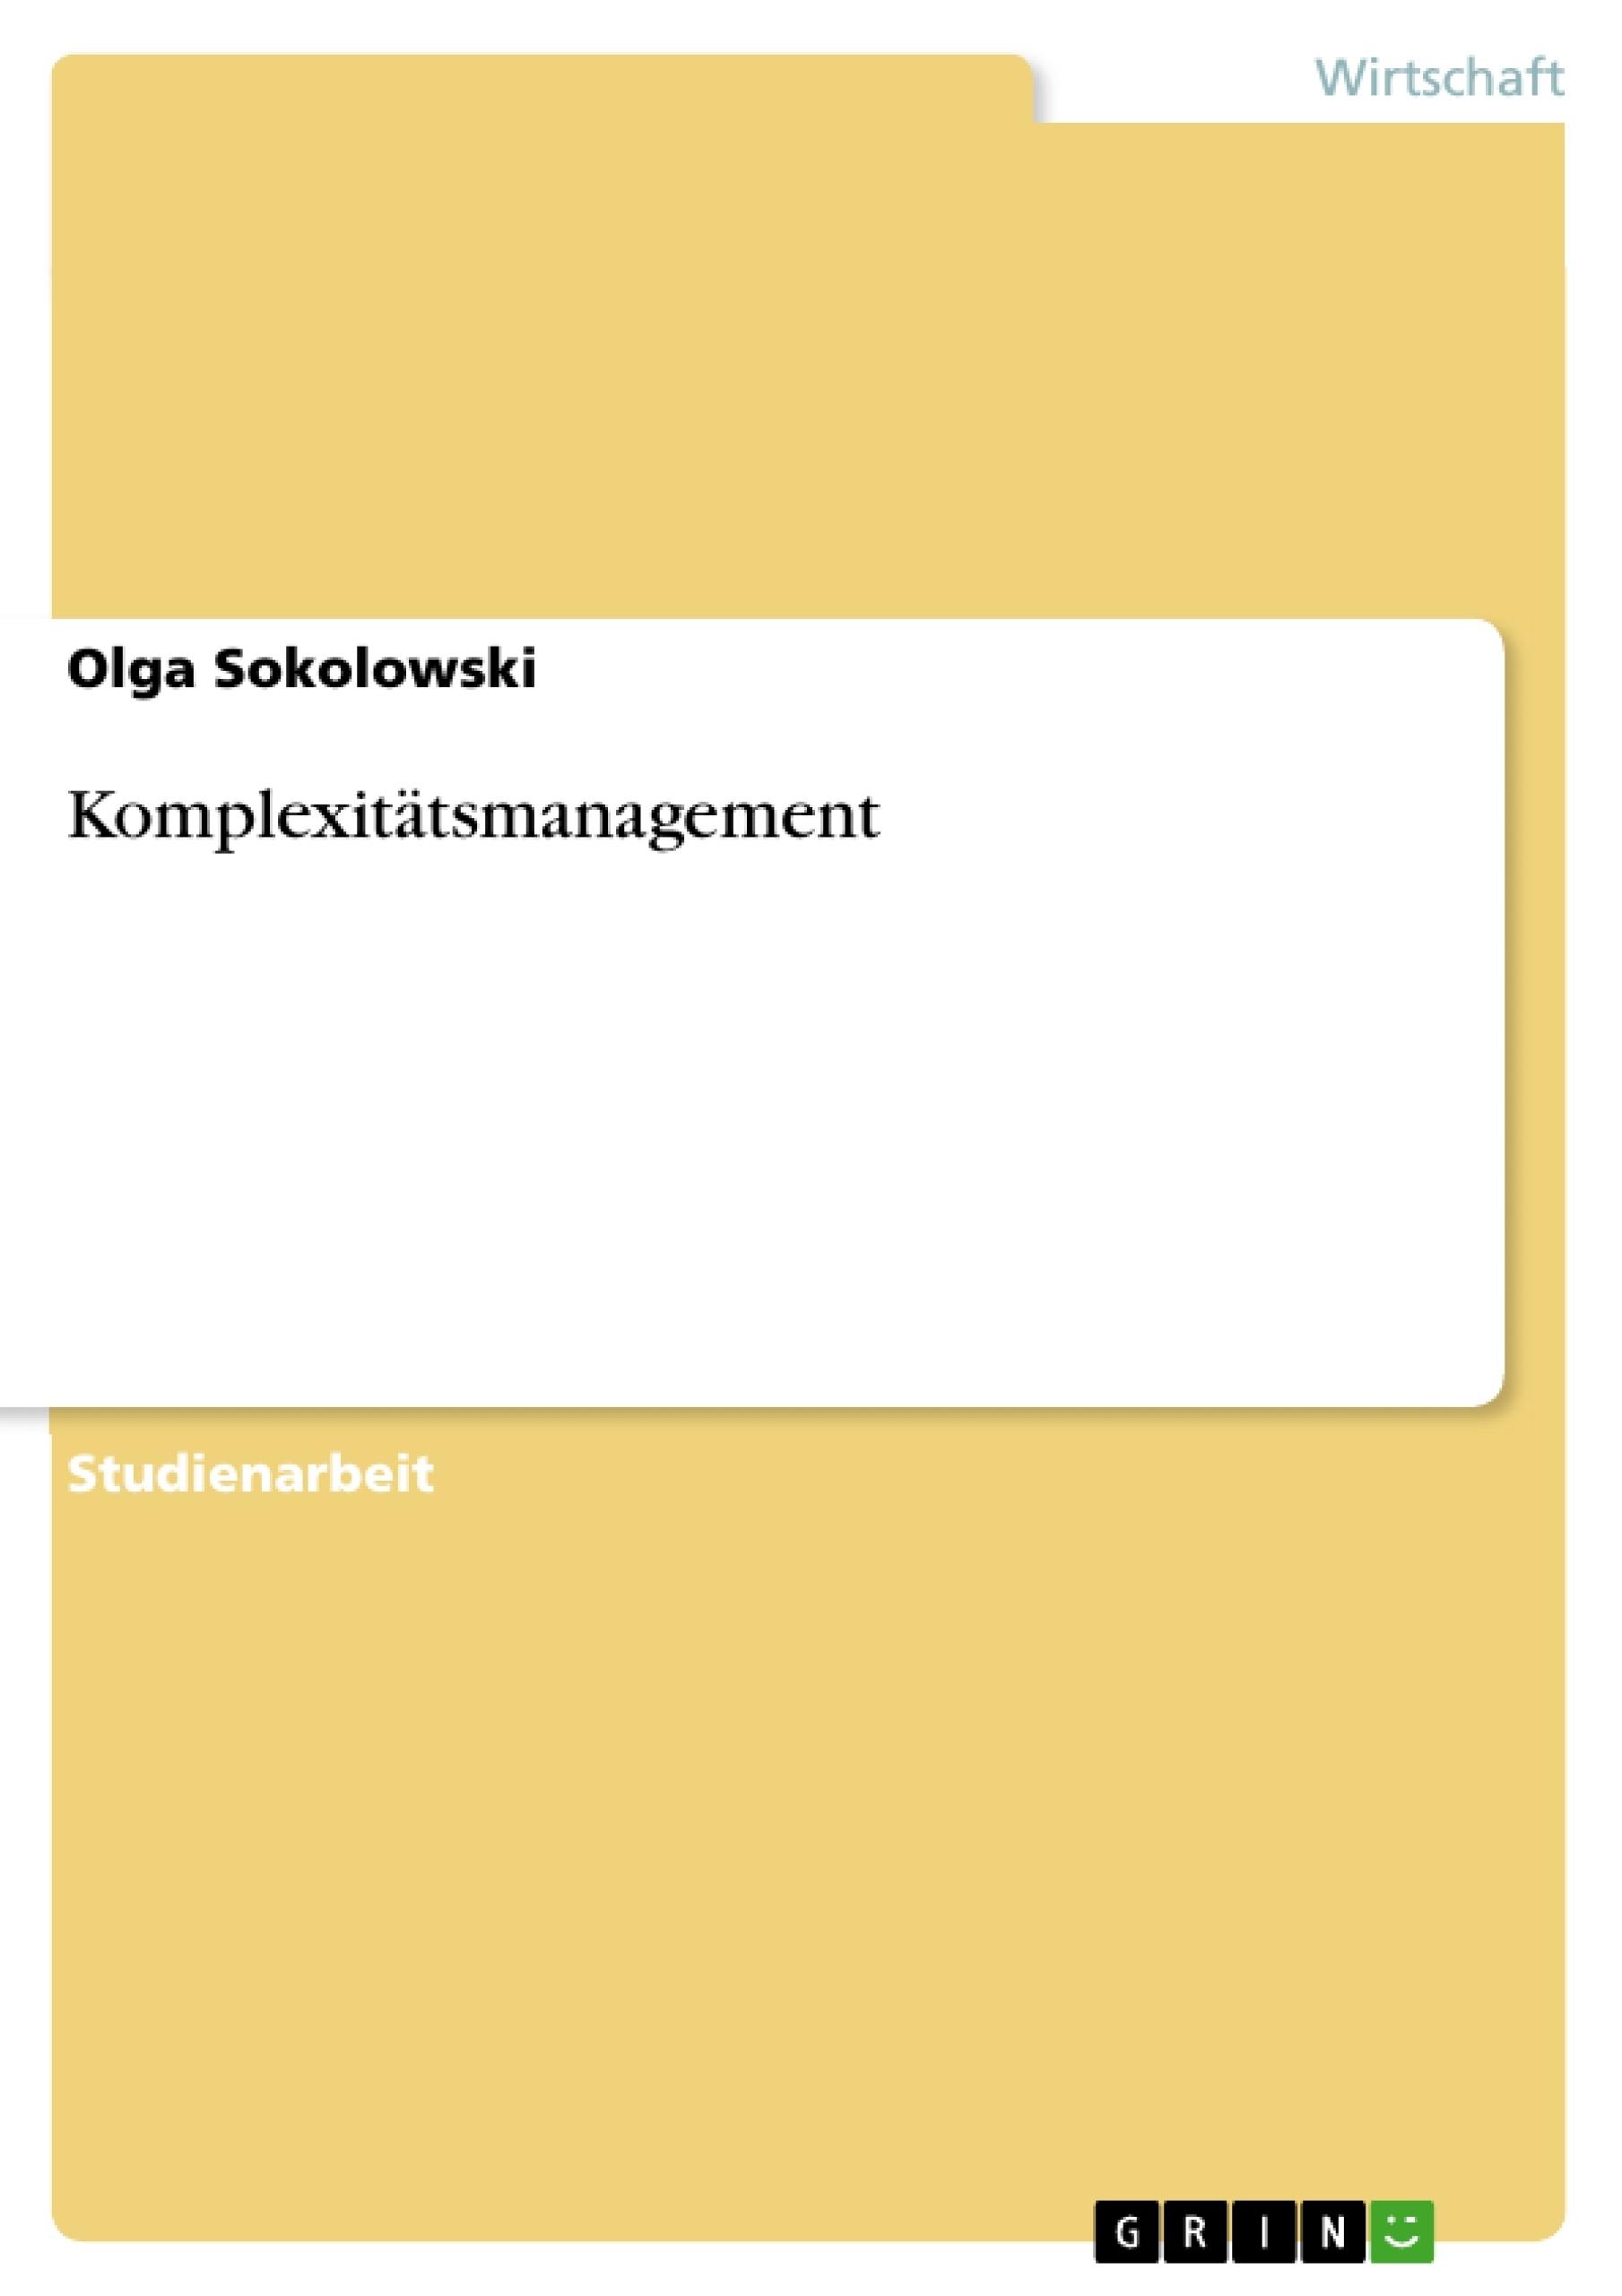 Titel: Komplexitätsmanagement